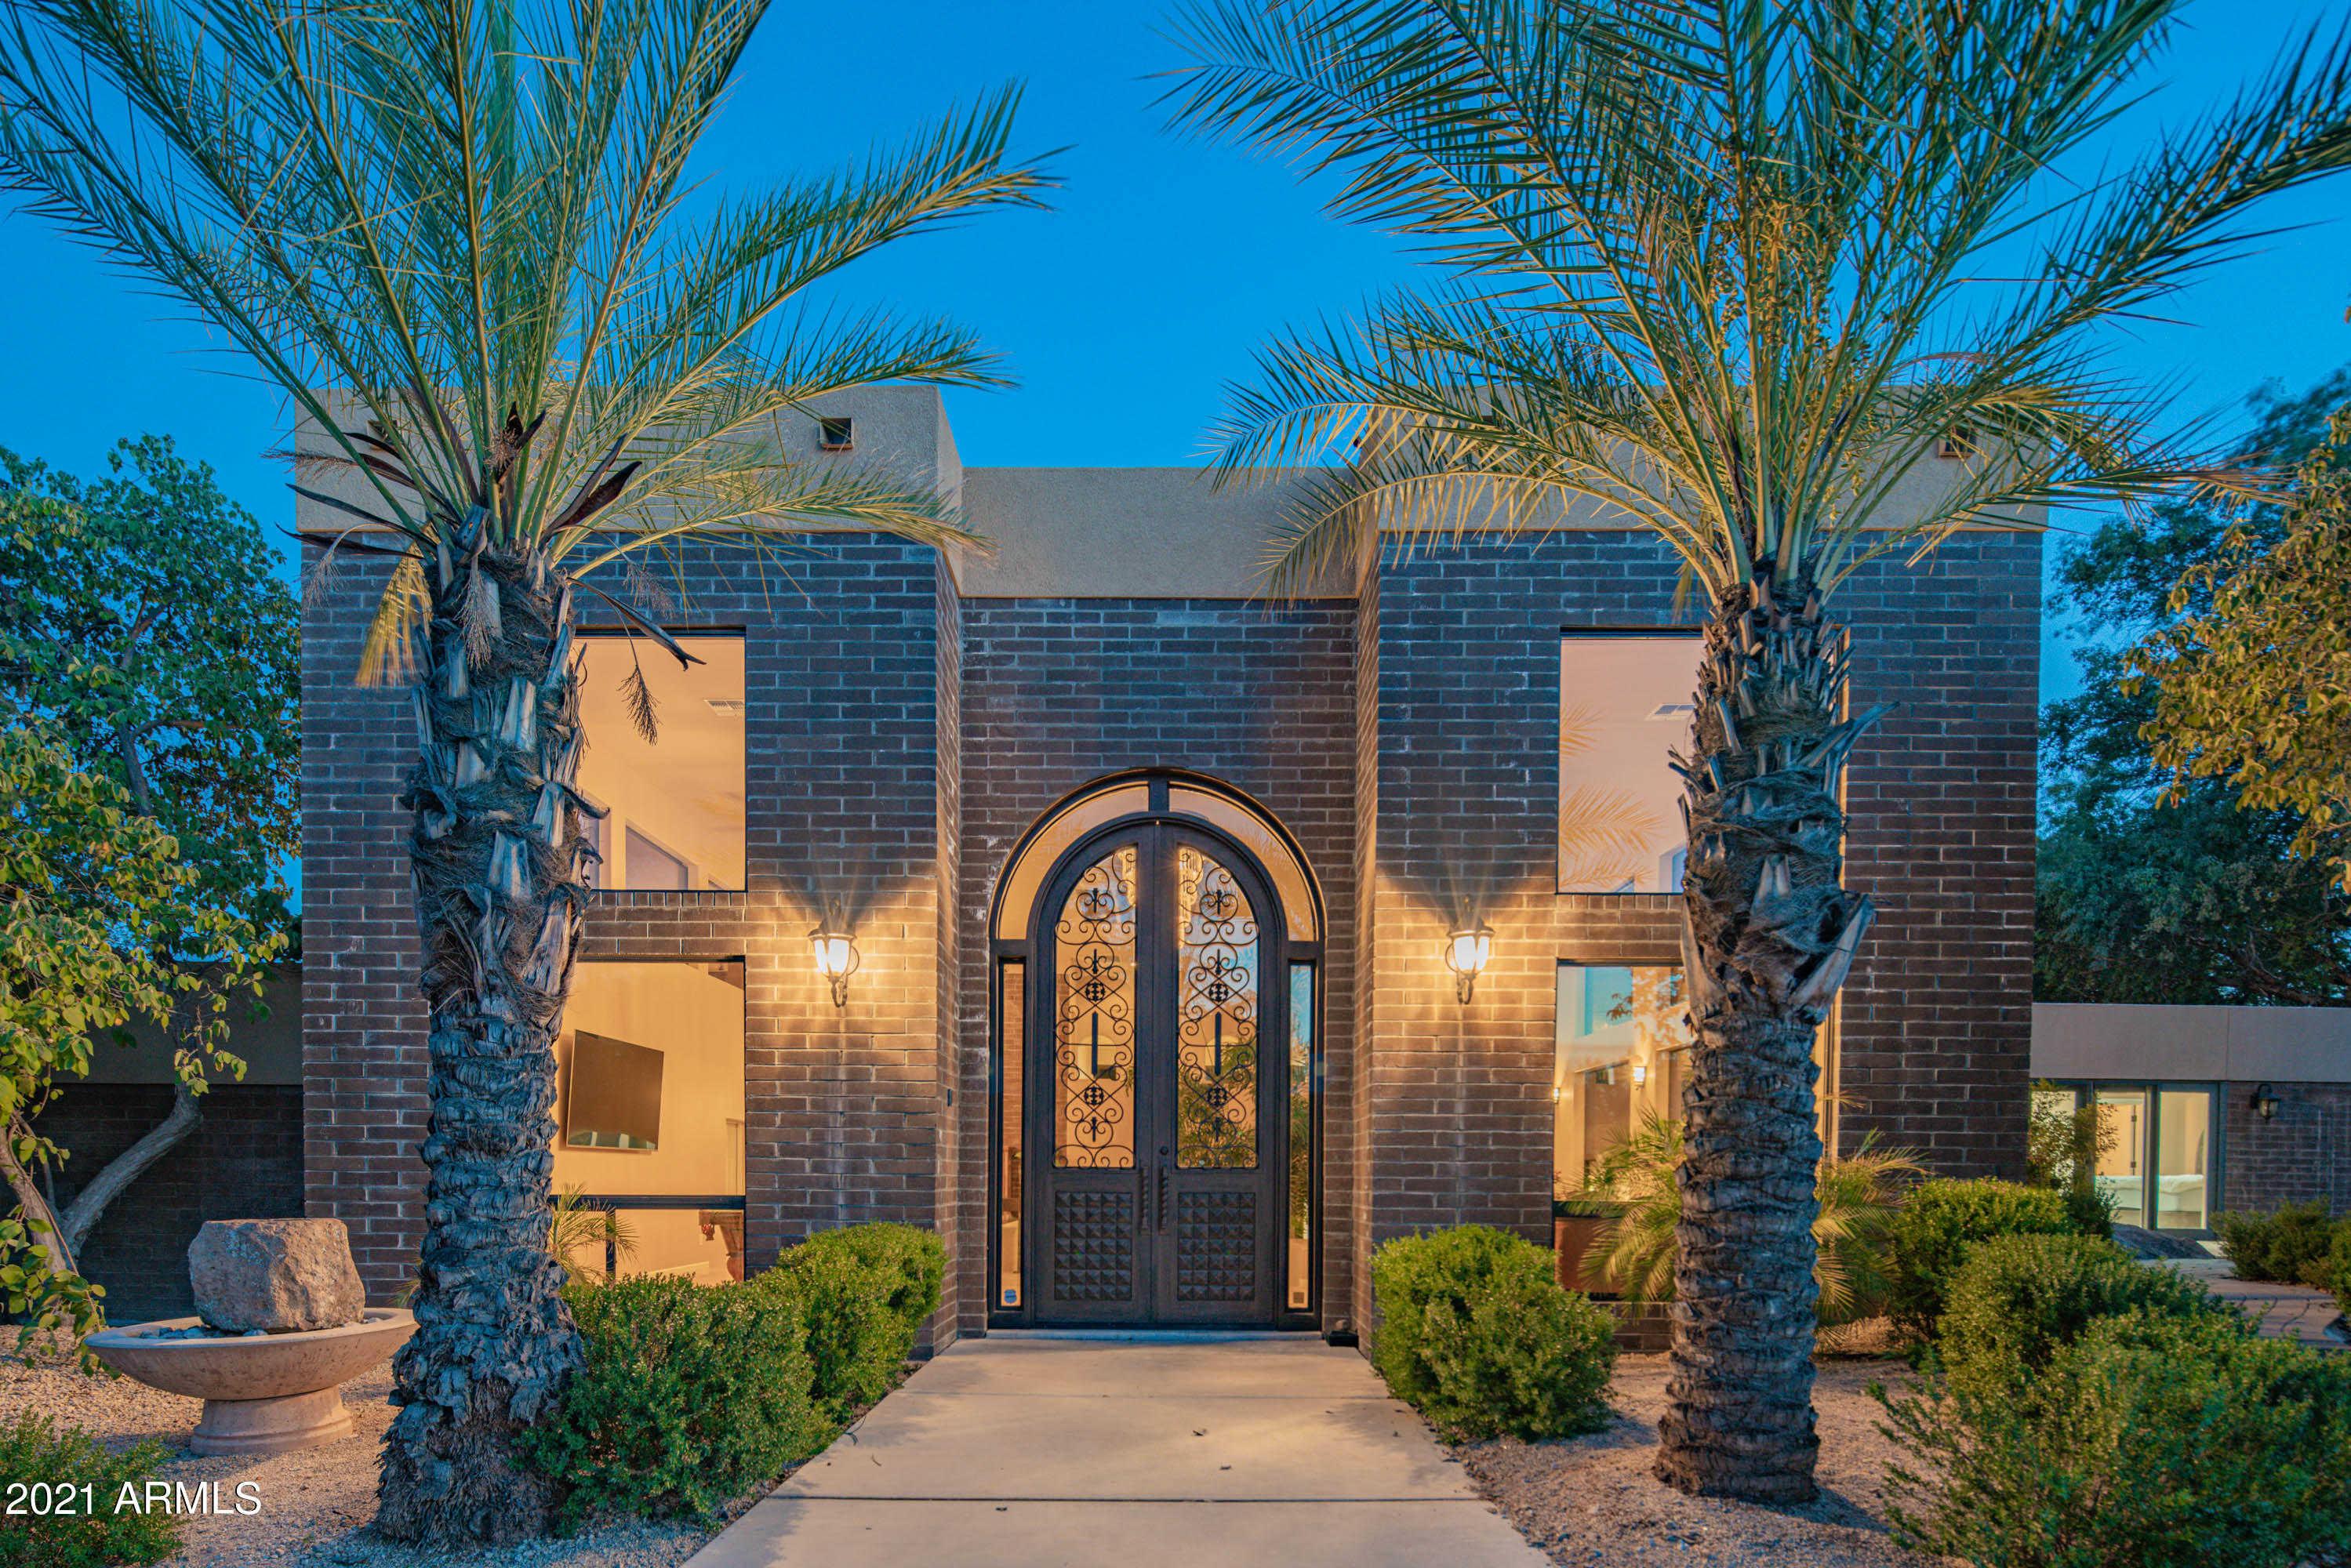 $2,995,000 - 6Br/7Ba - Home for Sale in Vivienne B Jennings 2 Lot Split Lot 1&2, Paradise Valley